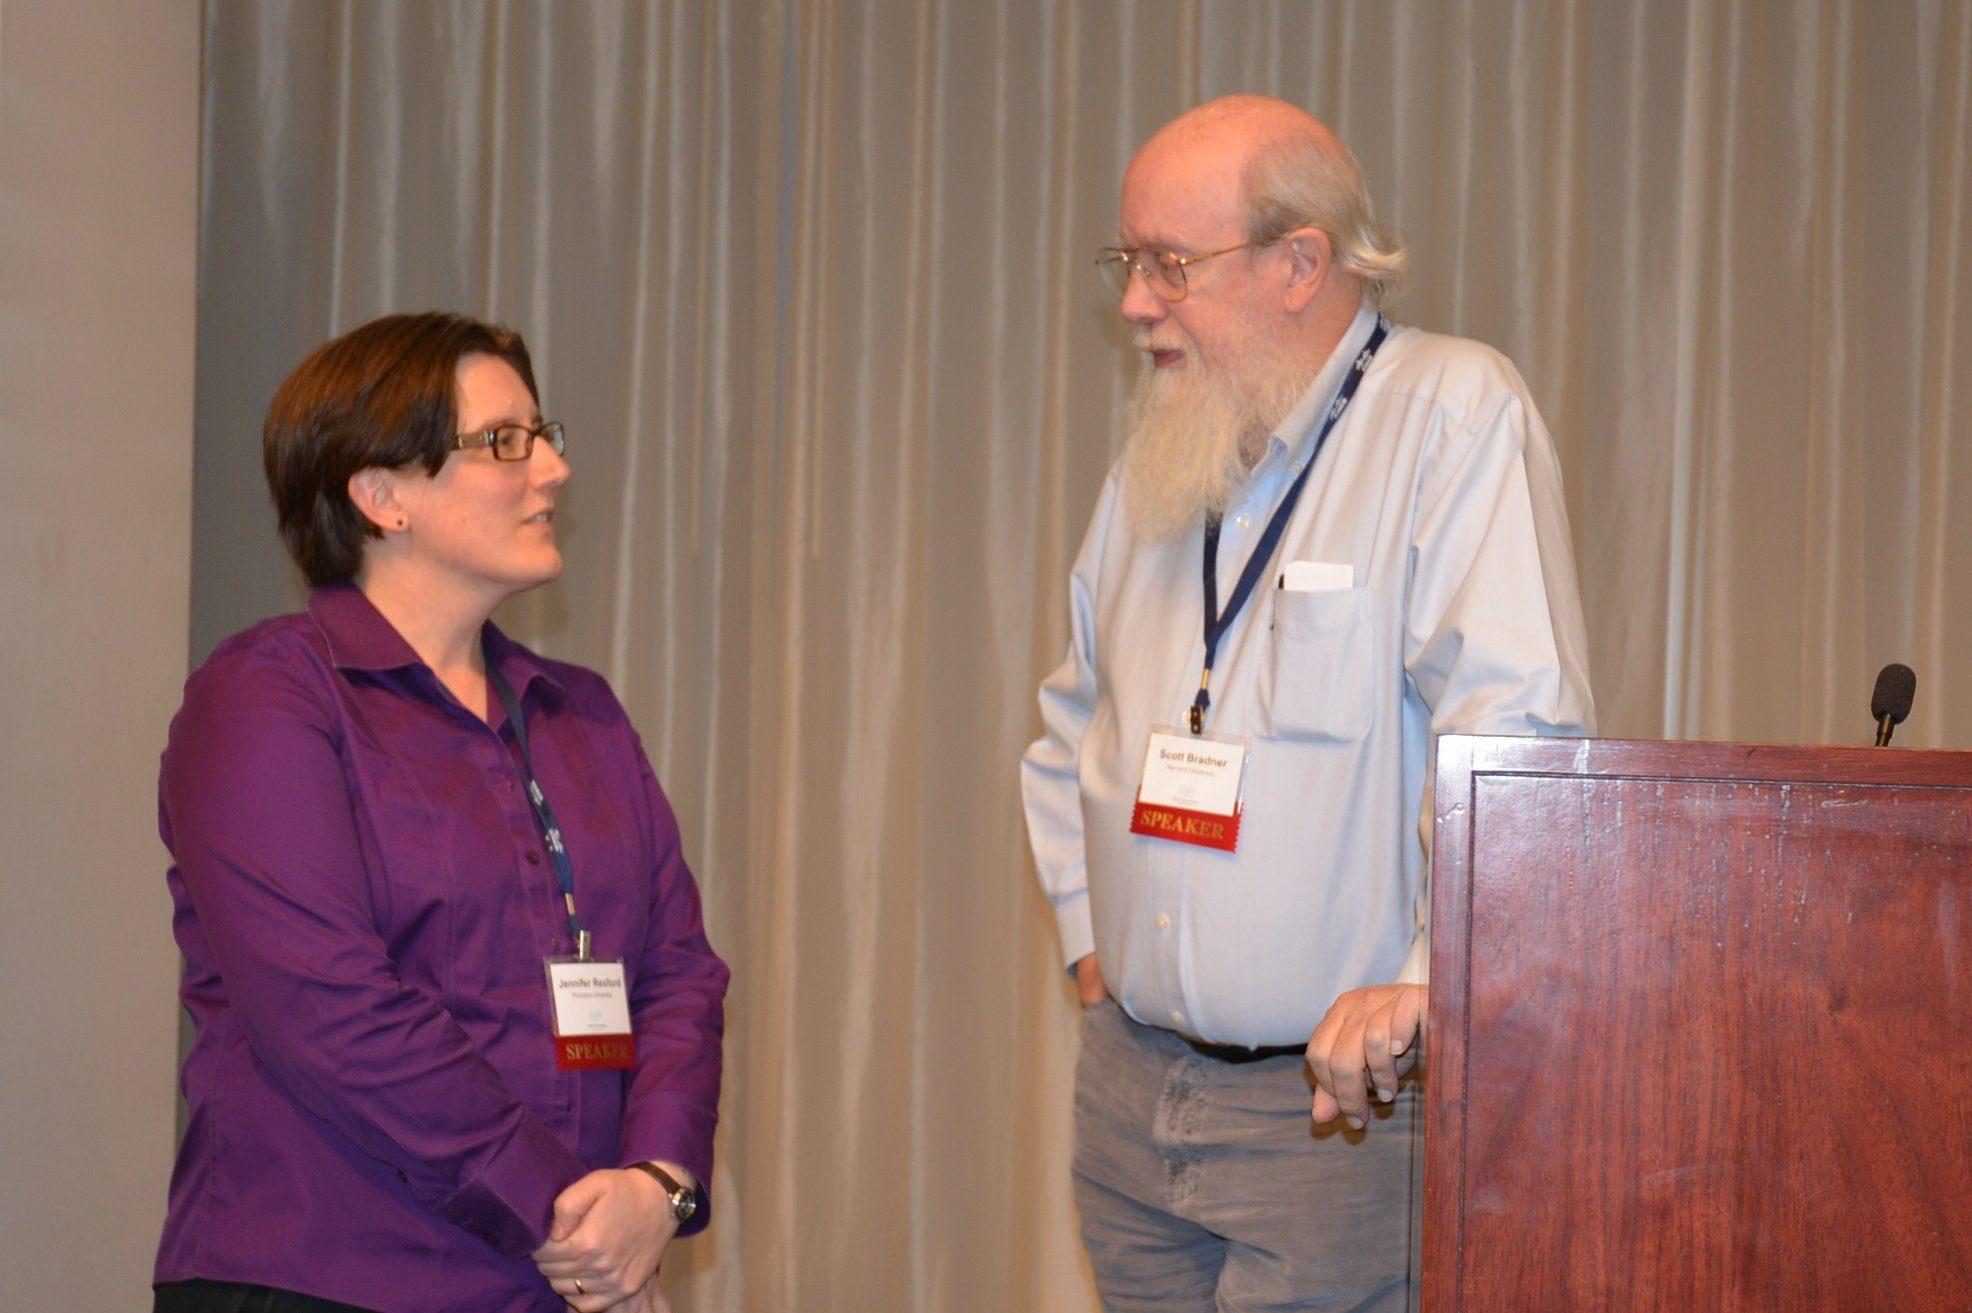 ONUG speakers Jennifer Rexford and Scott Bradner talk software-defined networking